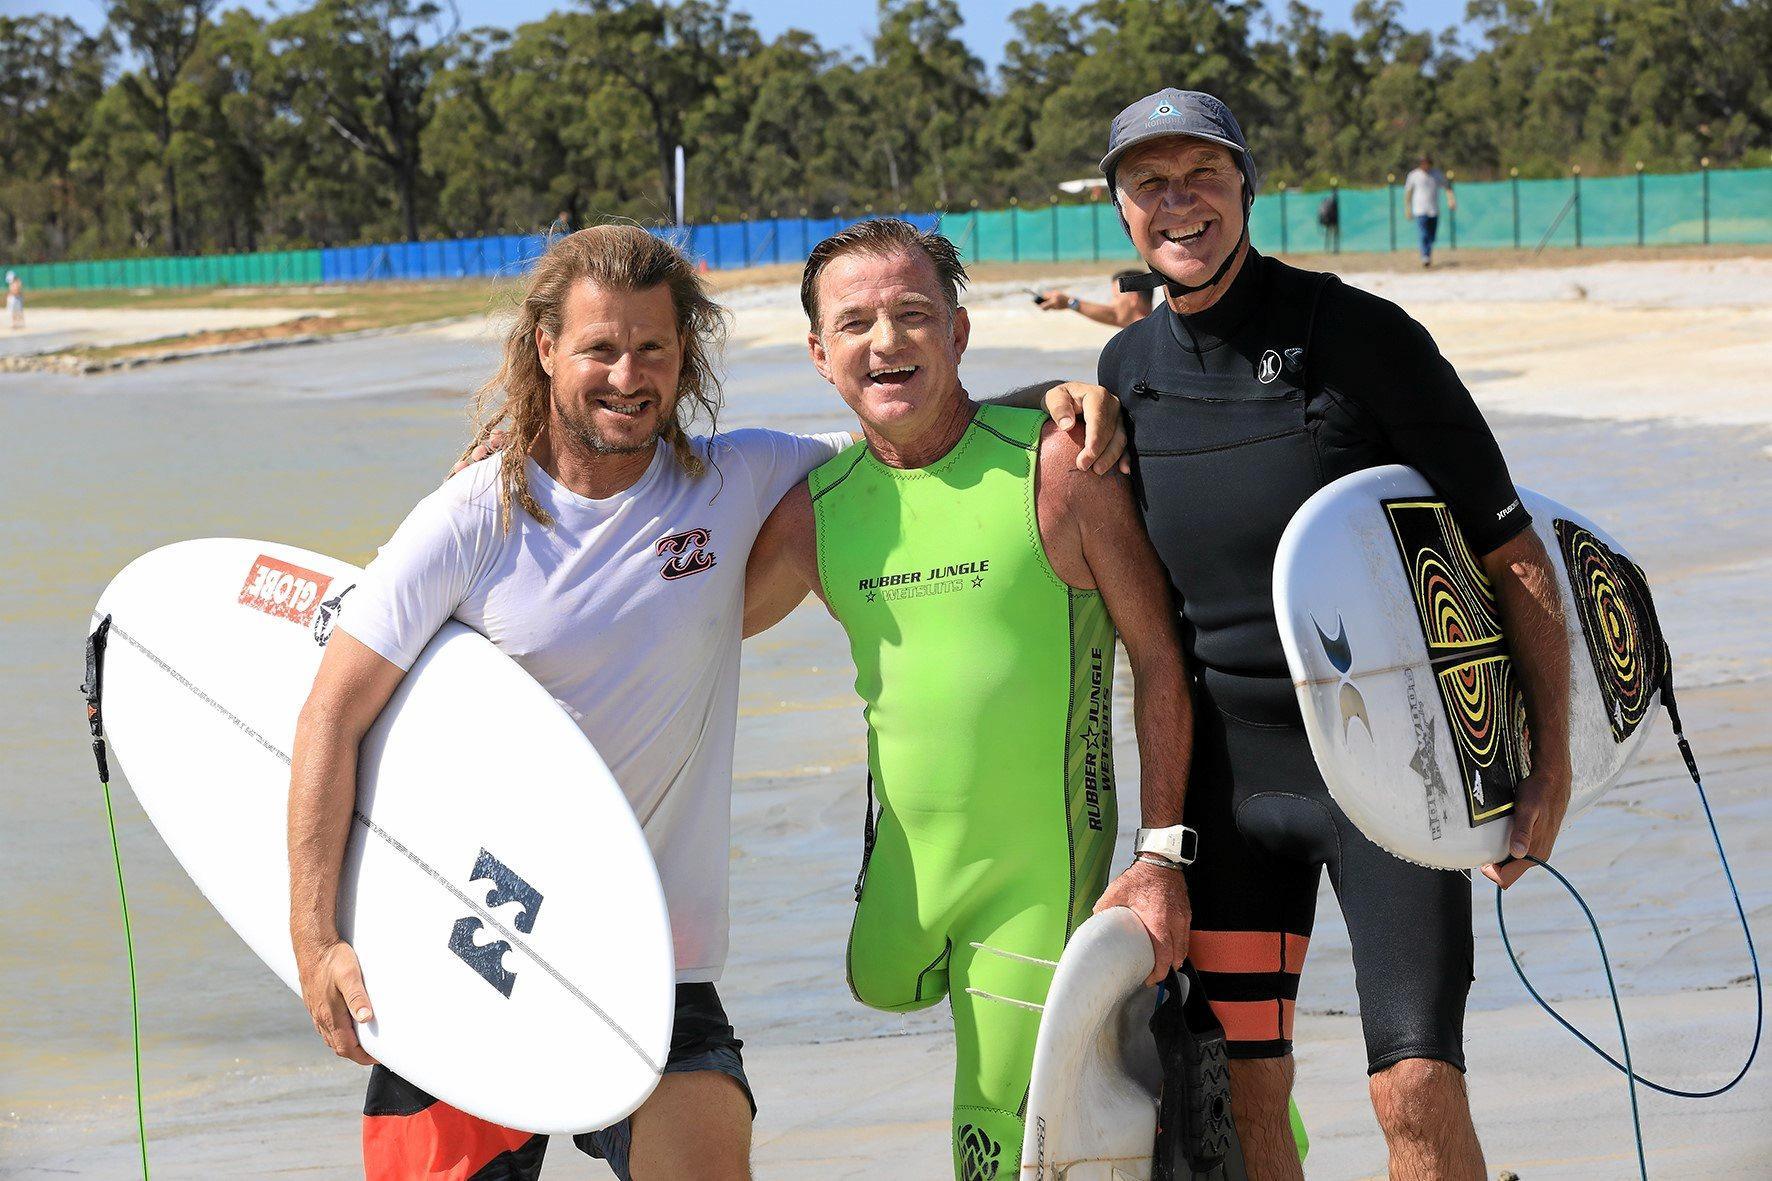 STOKED: Mark Occilupo, Mark 'Mono' Stewart and Barton Lynch at the 5 Waves Surf Lake facility in Yepoon.